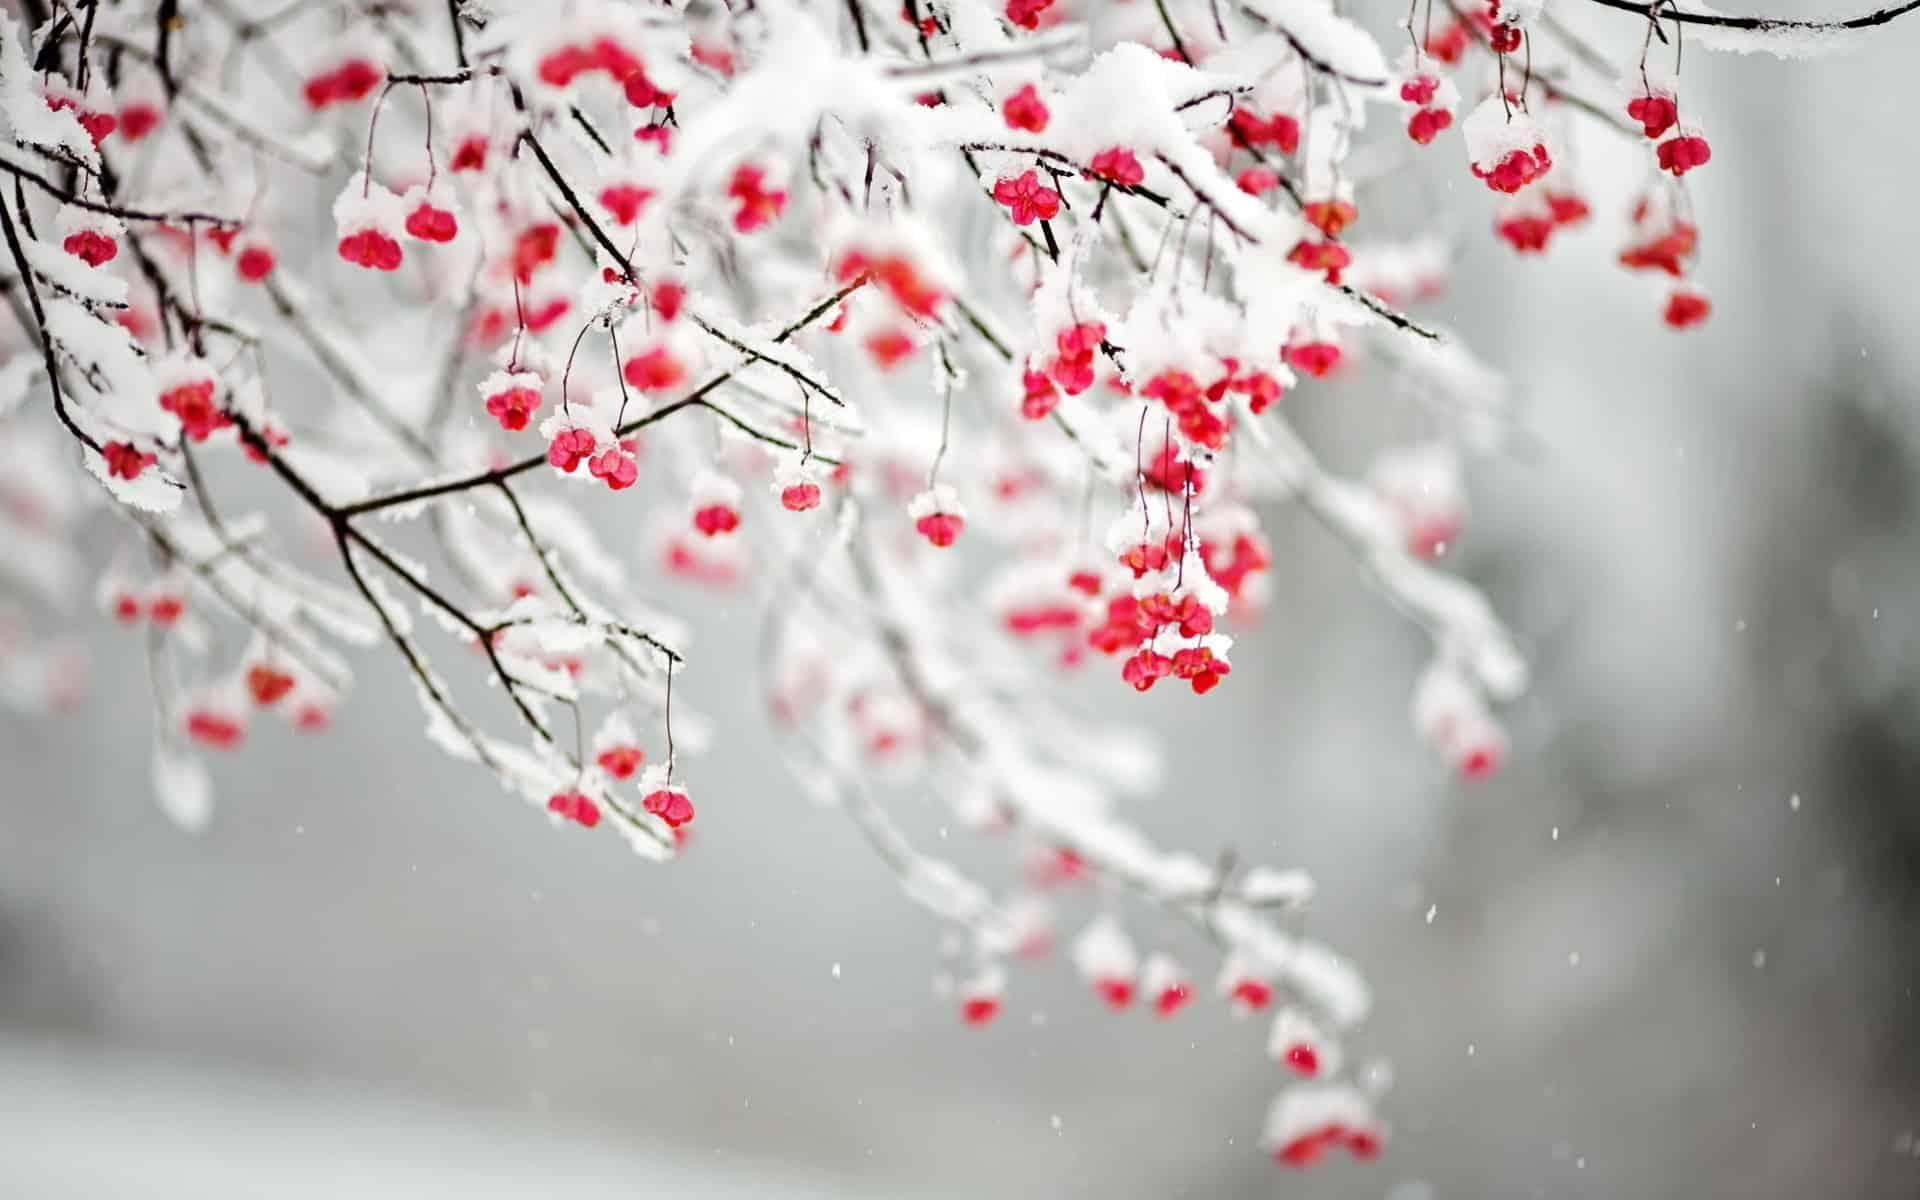 božično drevesce wd40